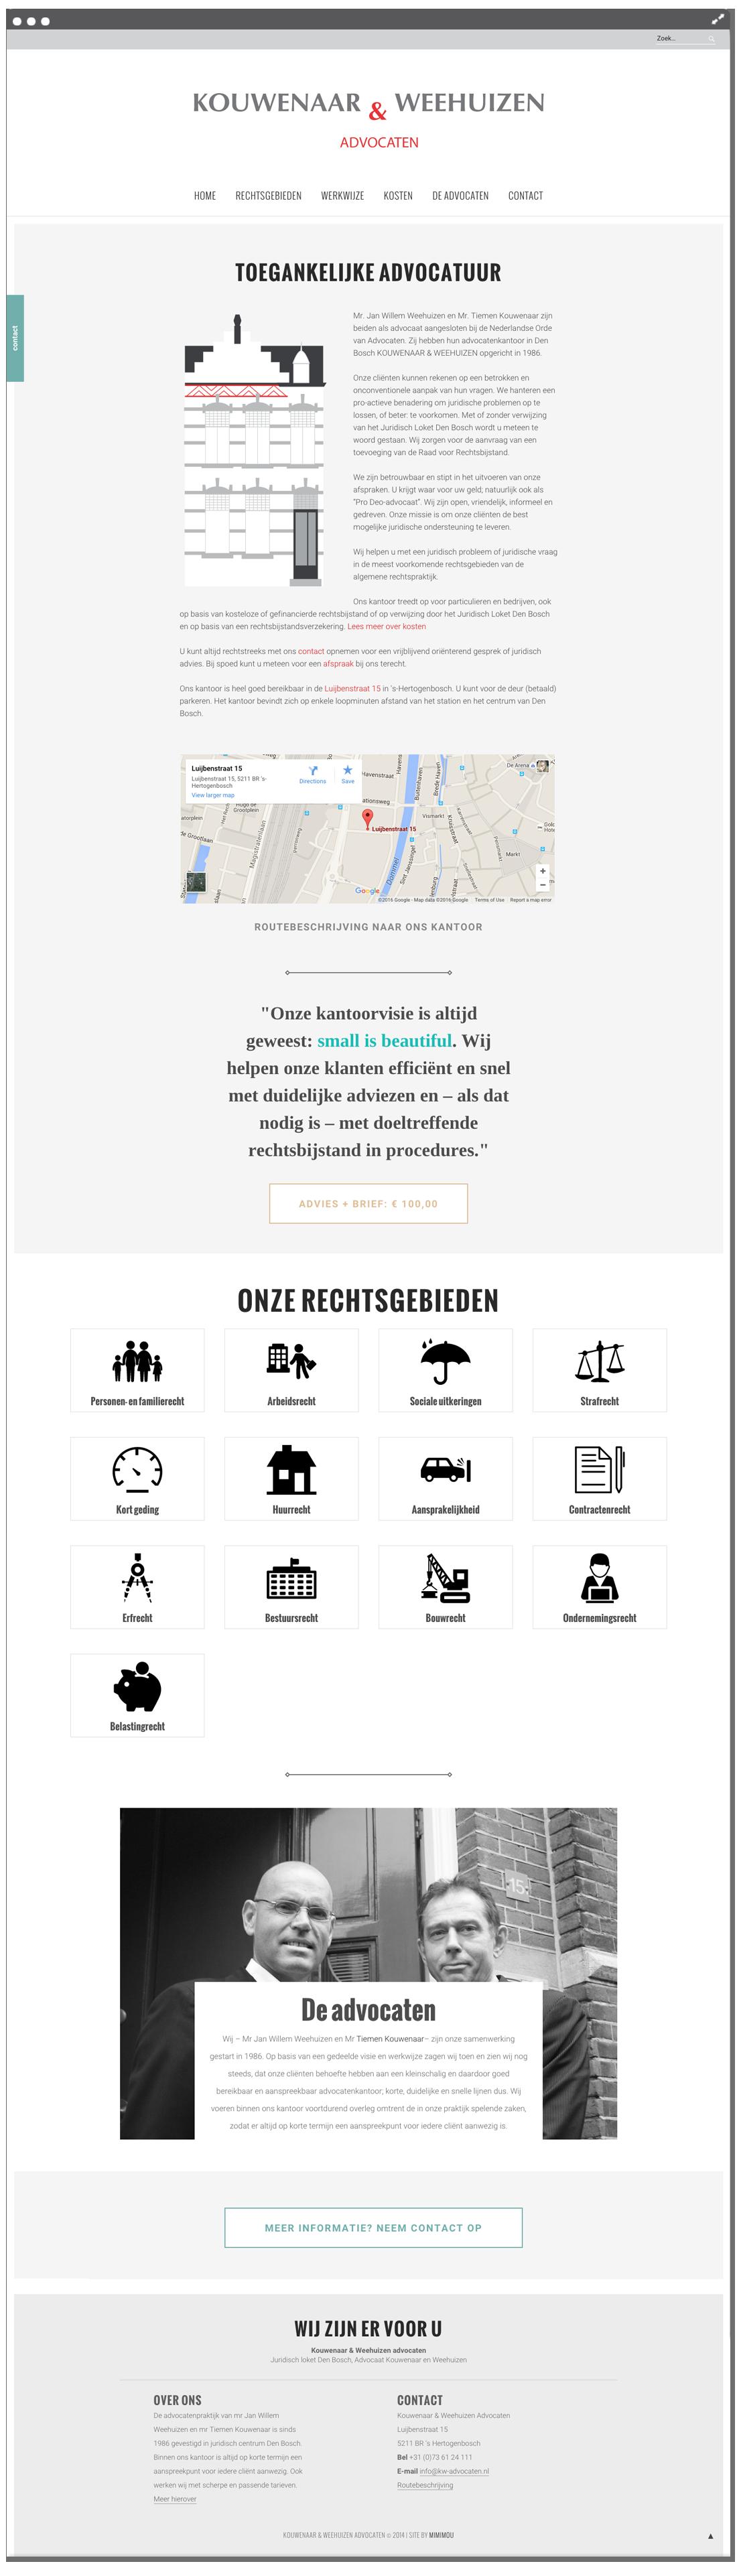 KW_Advocaten_homepage_Mimimou